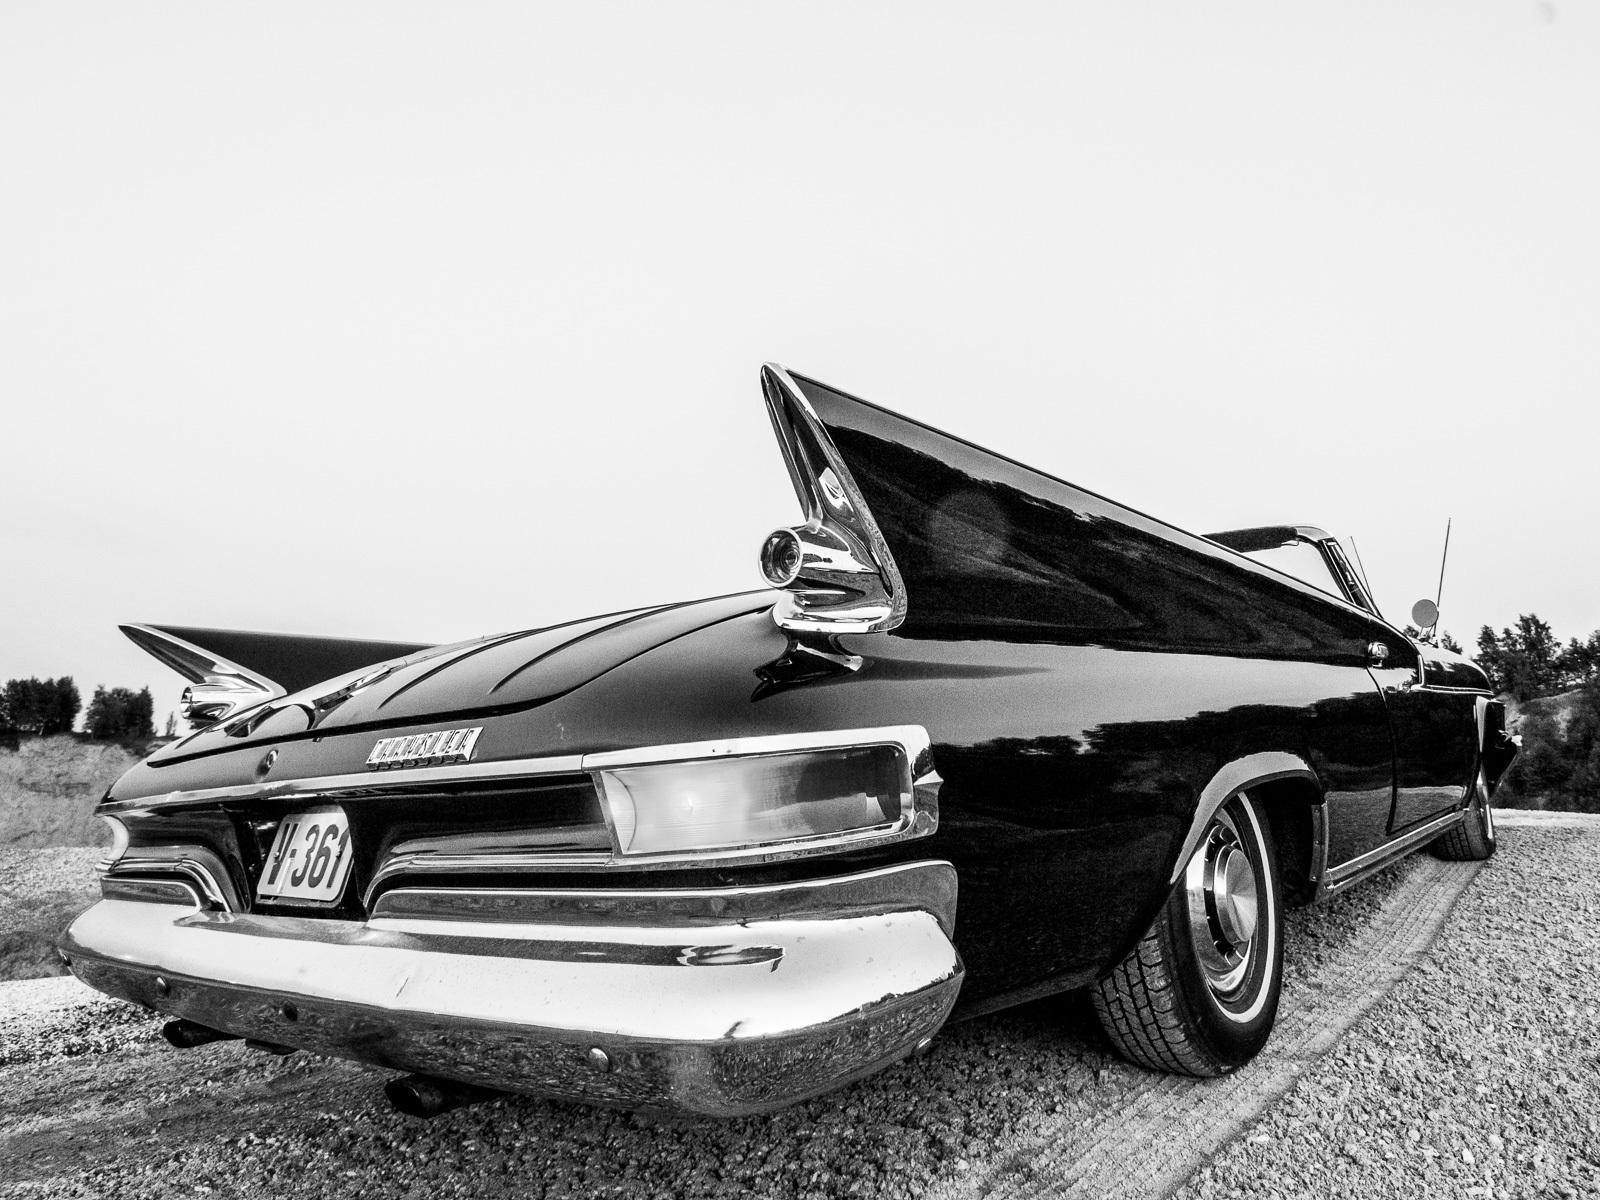 013-1961 Chrysler Newport Convertible 04. Eier- me